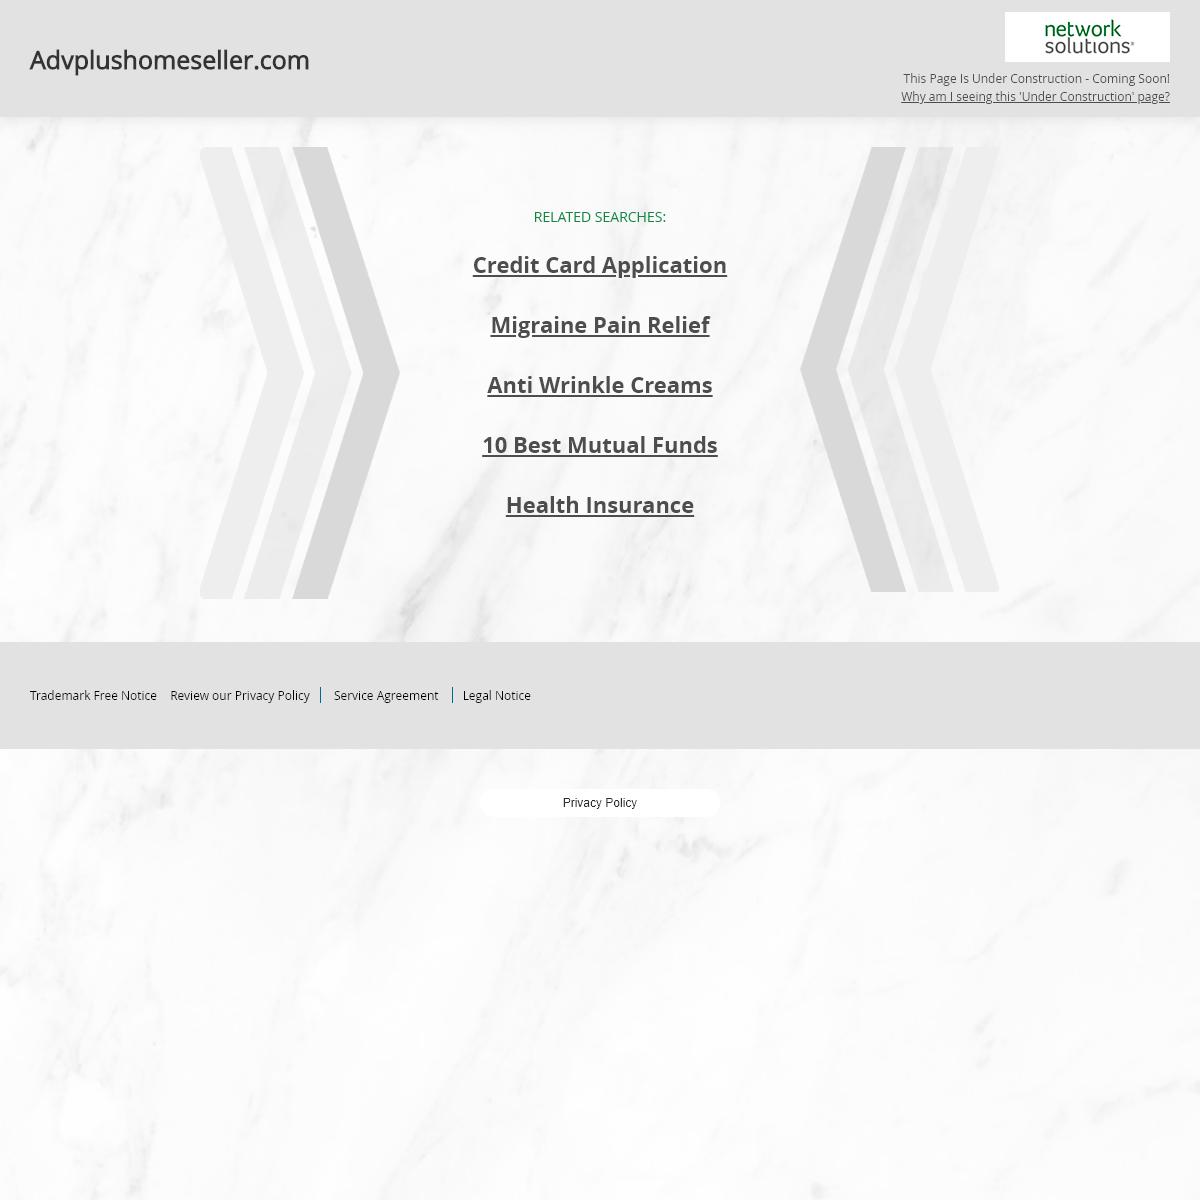 Advplushomeseller.com